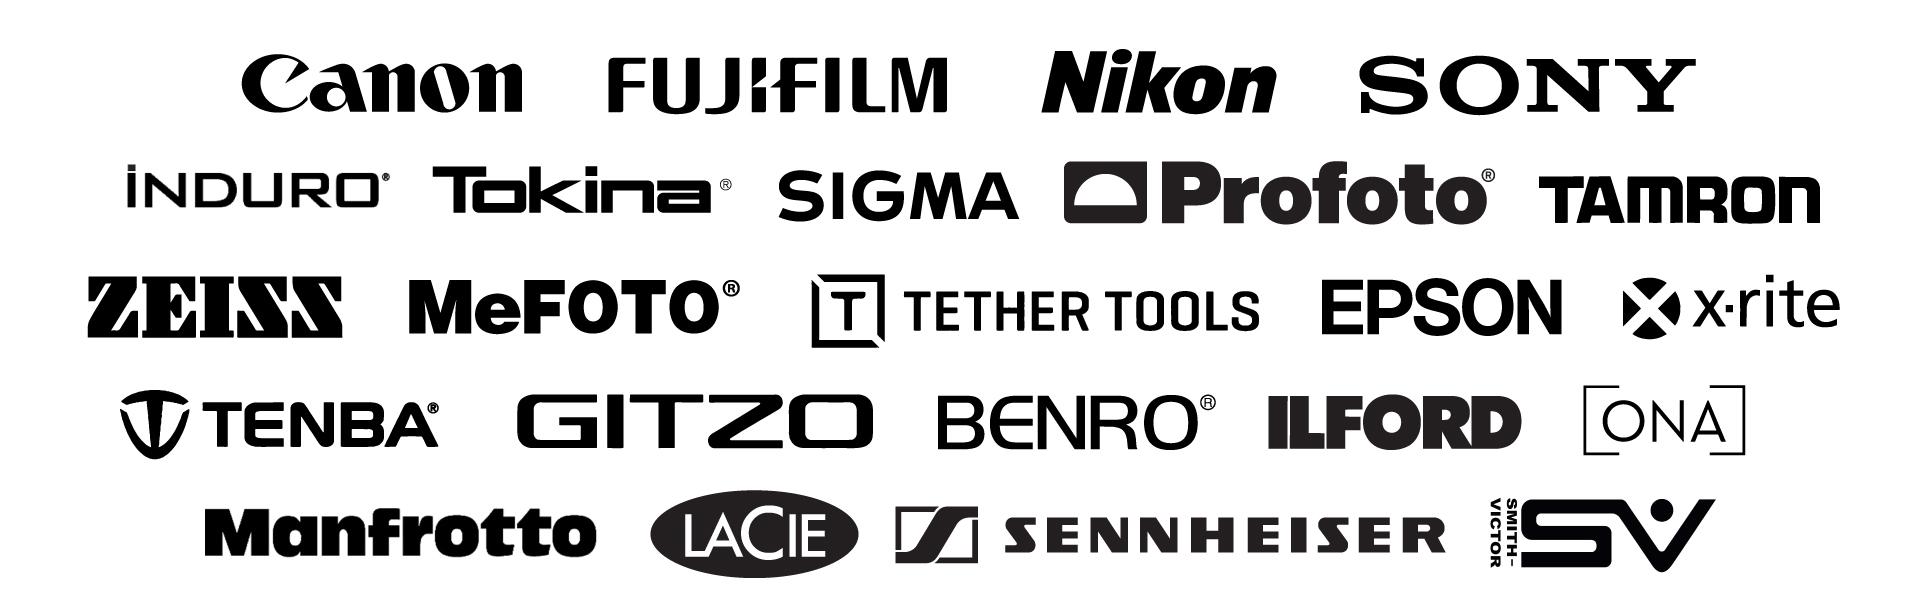 Brands_Index.jpg